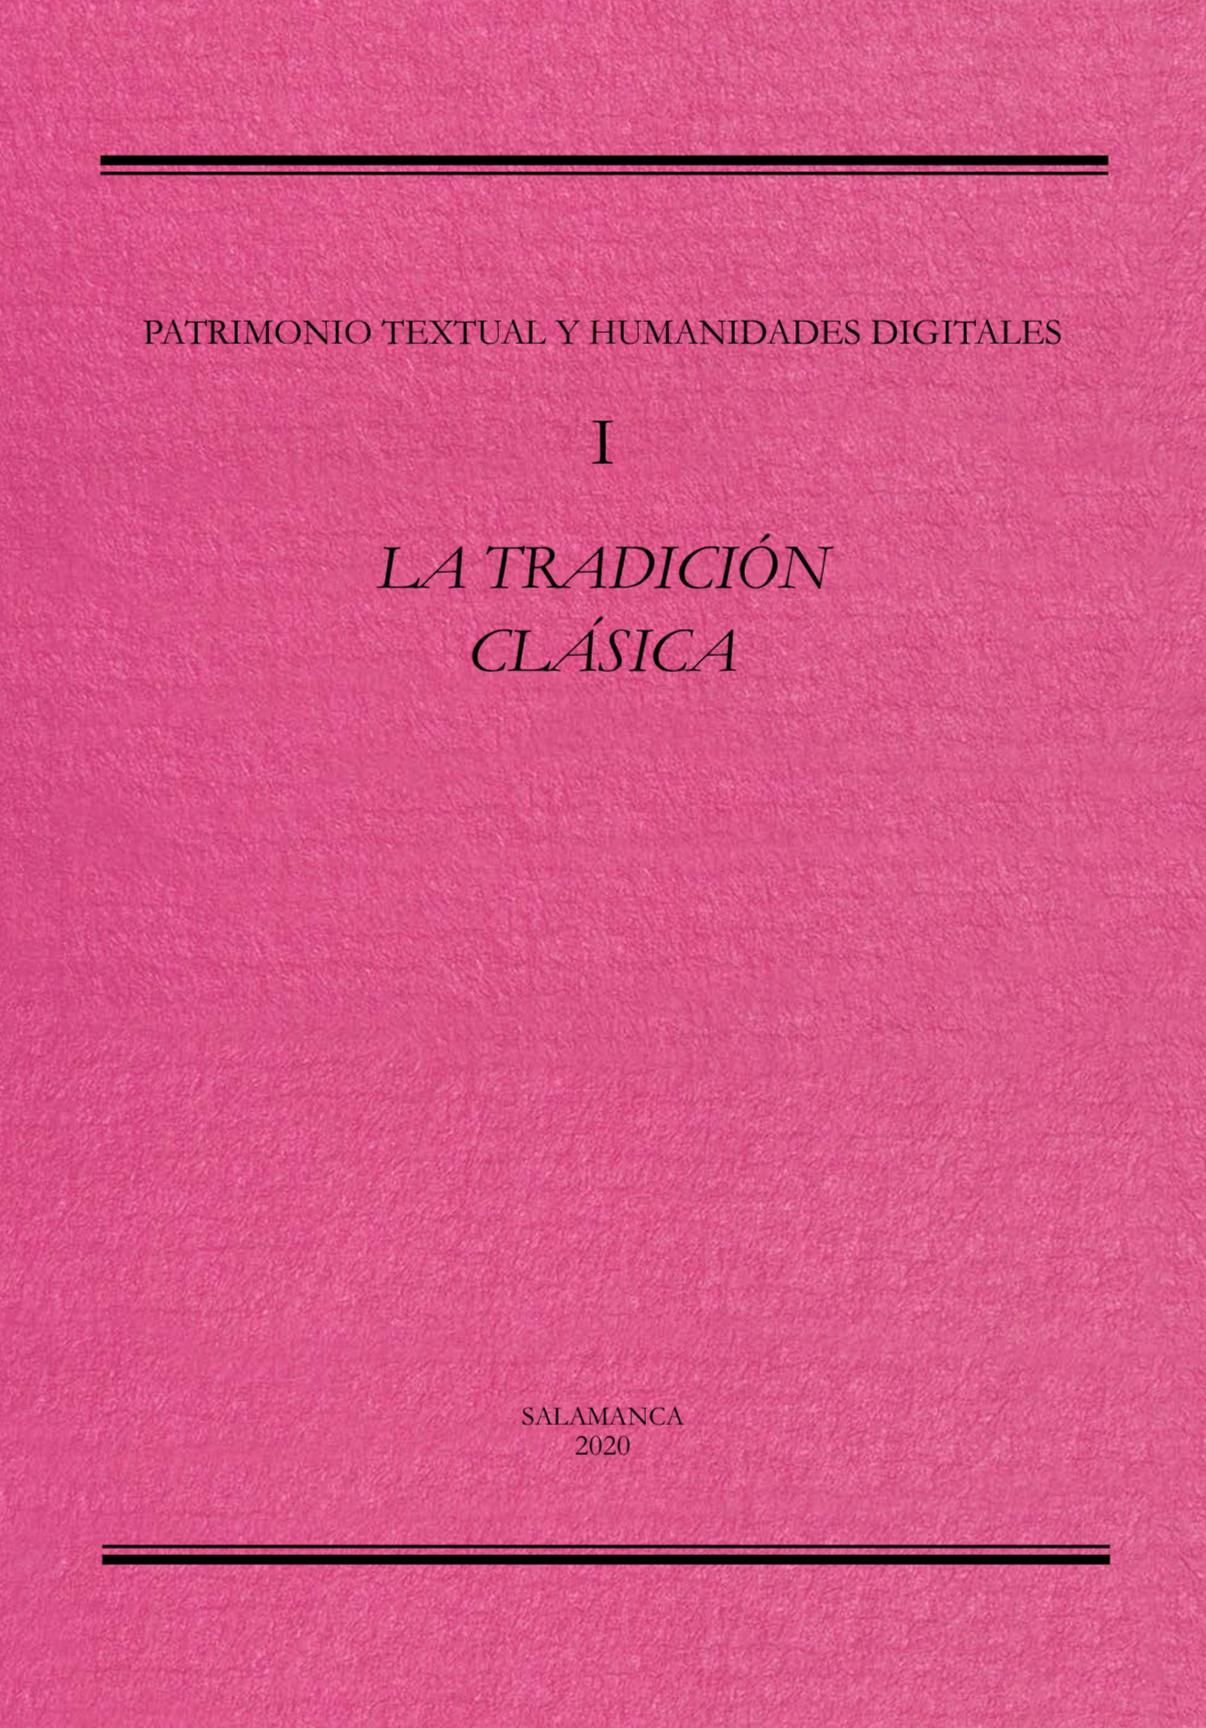 I. LA TRADICIÓN CLÁSICA, SALAMANCA